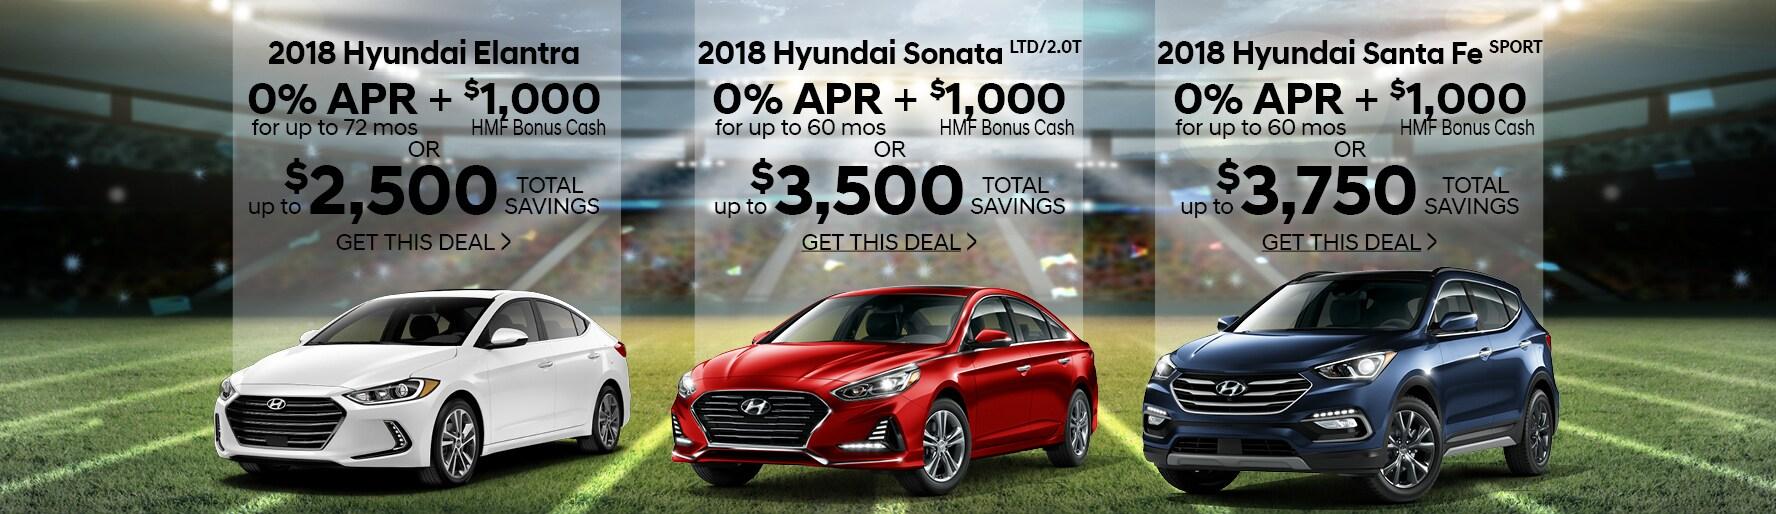 Hyundai of yuma new genesis hyundai dealership in yuma az 85365 previous next solutioingenieria Image collections